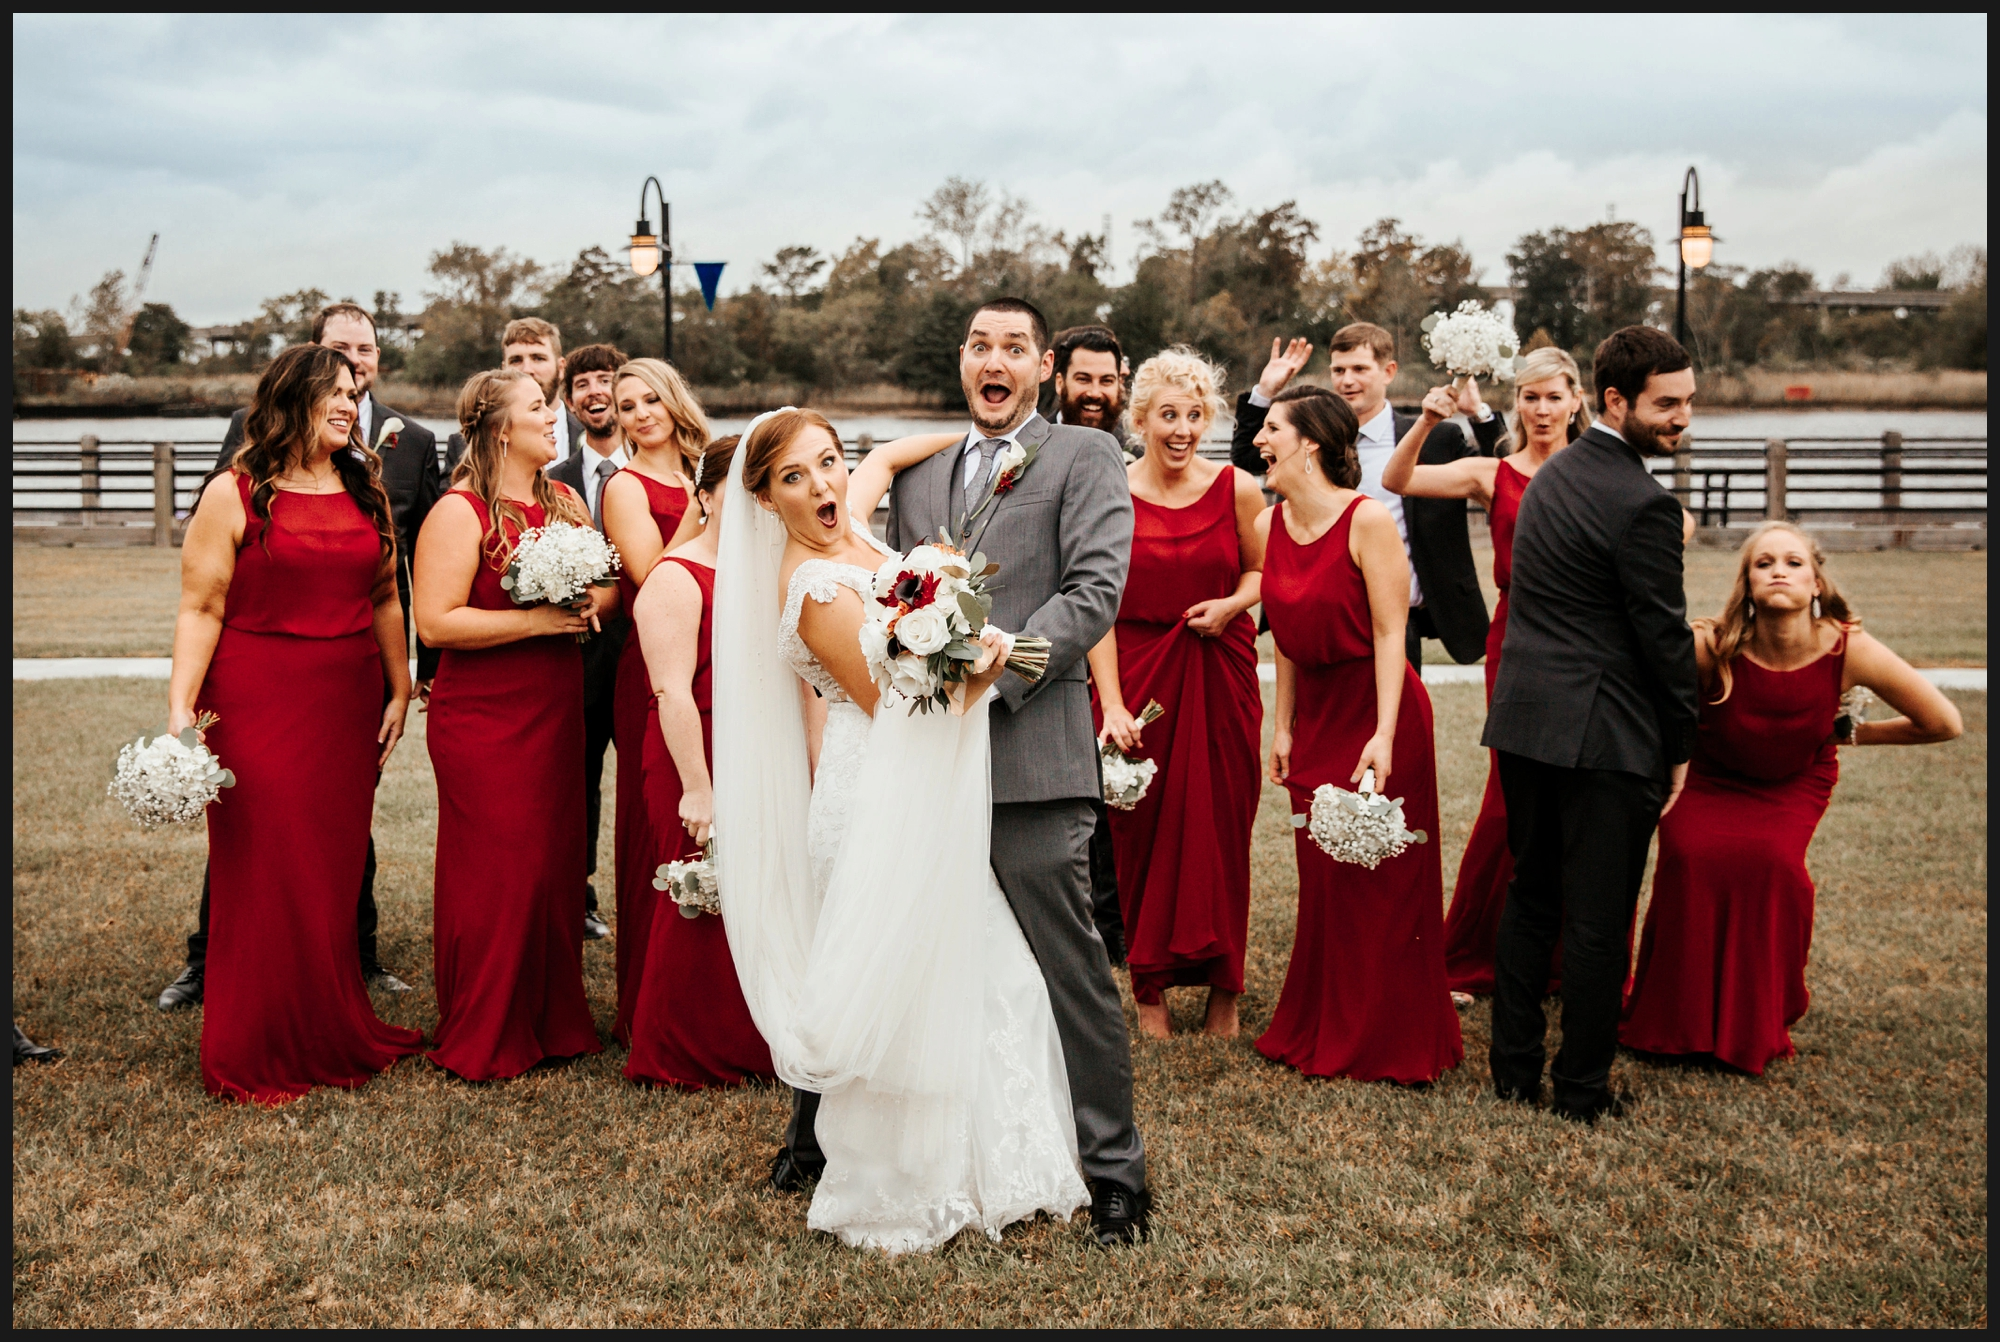 Orlando-Wedding-Photographer-destination-wedding-photographer-florida-wedding-photographer-bohemian-wedding-photographer_0635.jpg